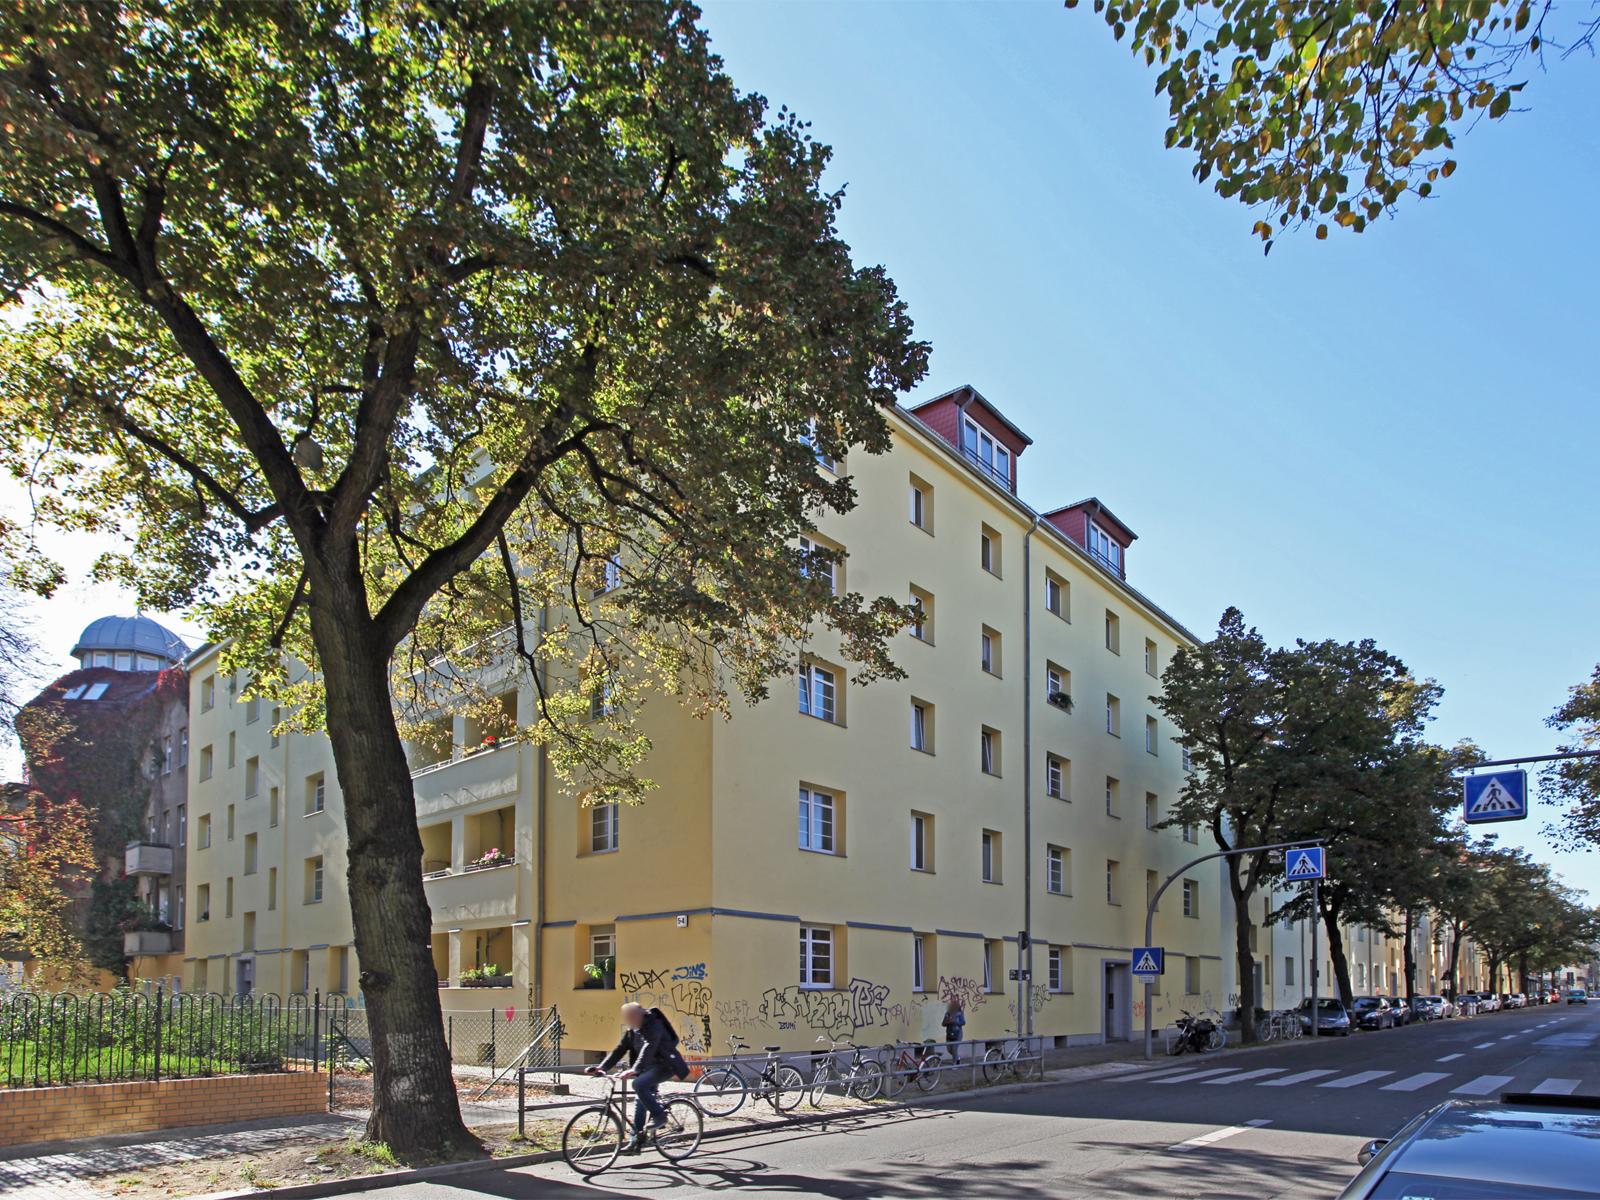 Silberstein & Herta. Berlin Property Investment.